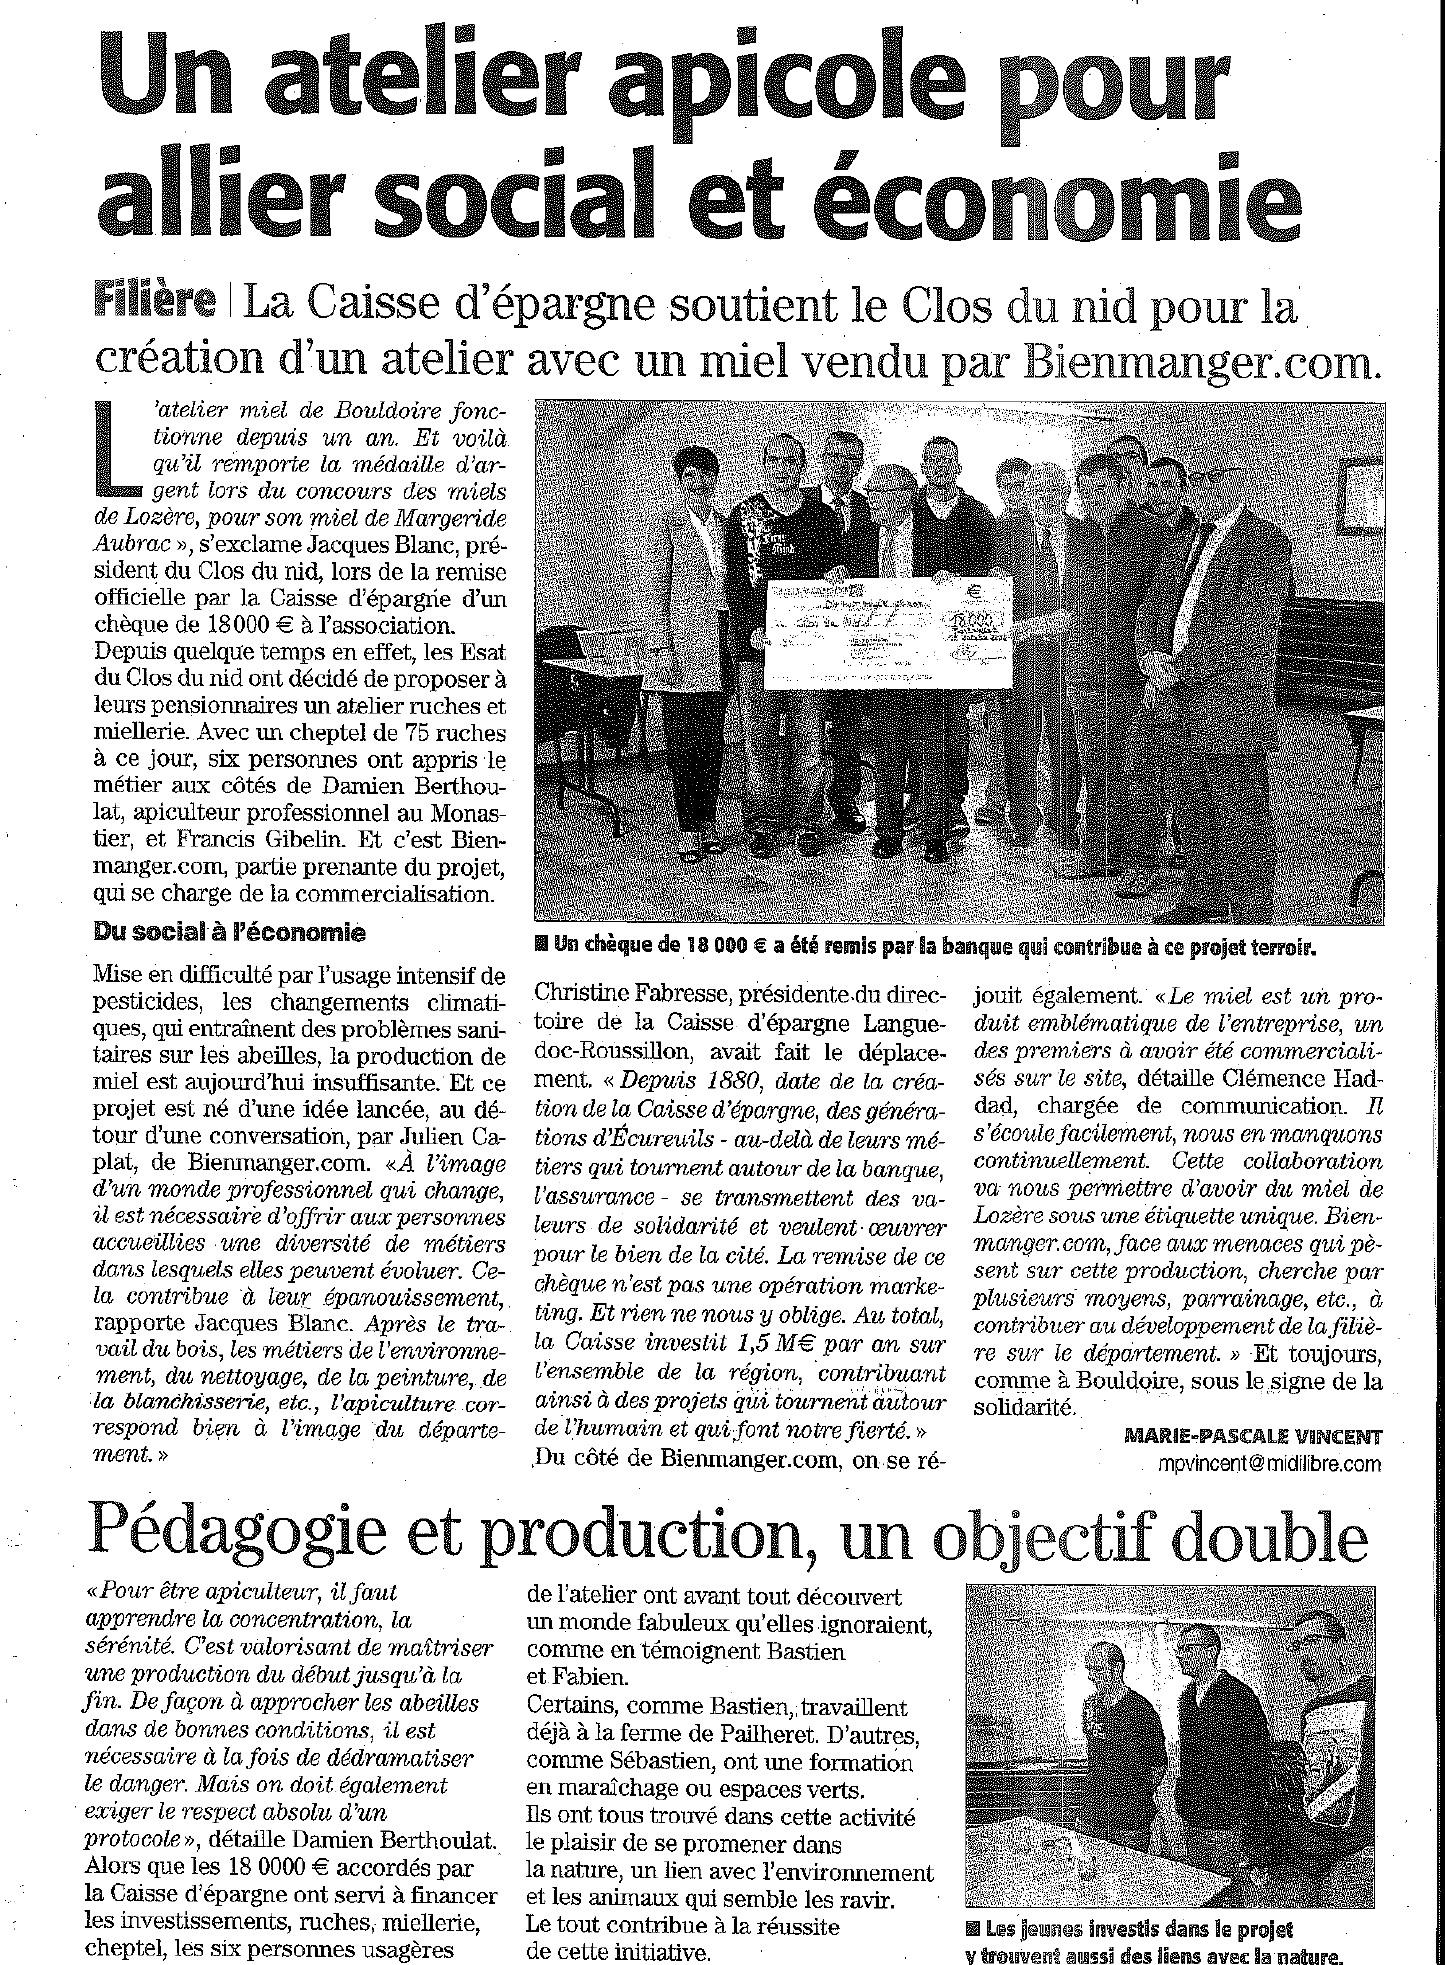 Article paru dans Midi Libre le 19 octobre 2016